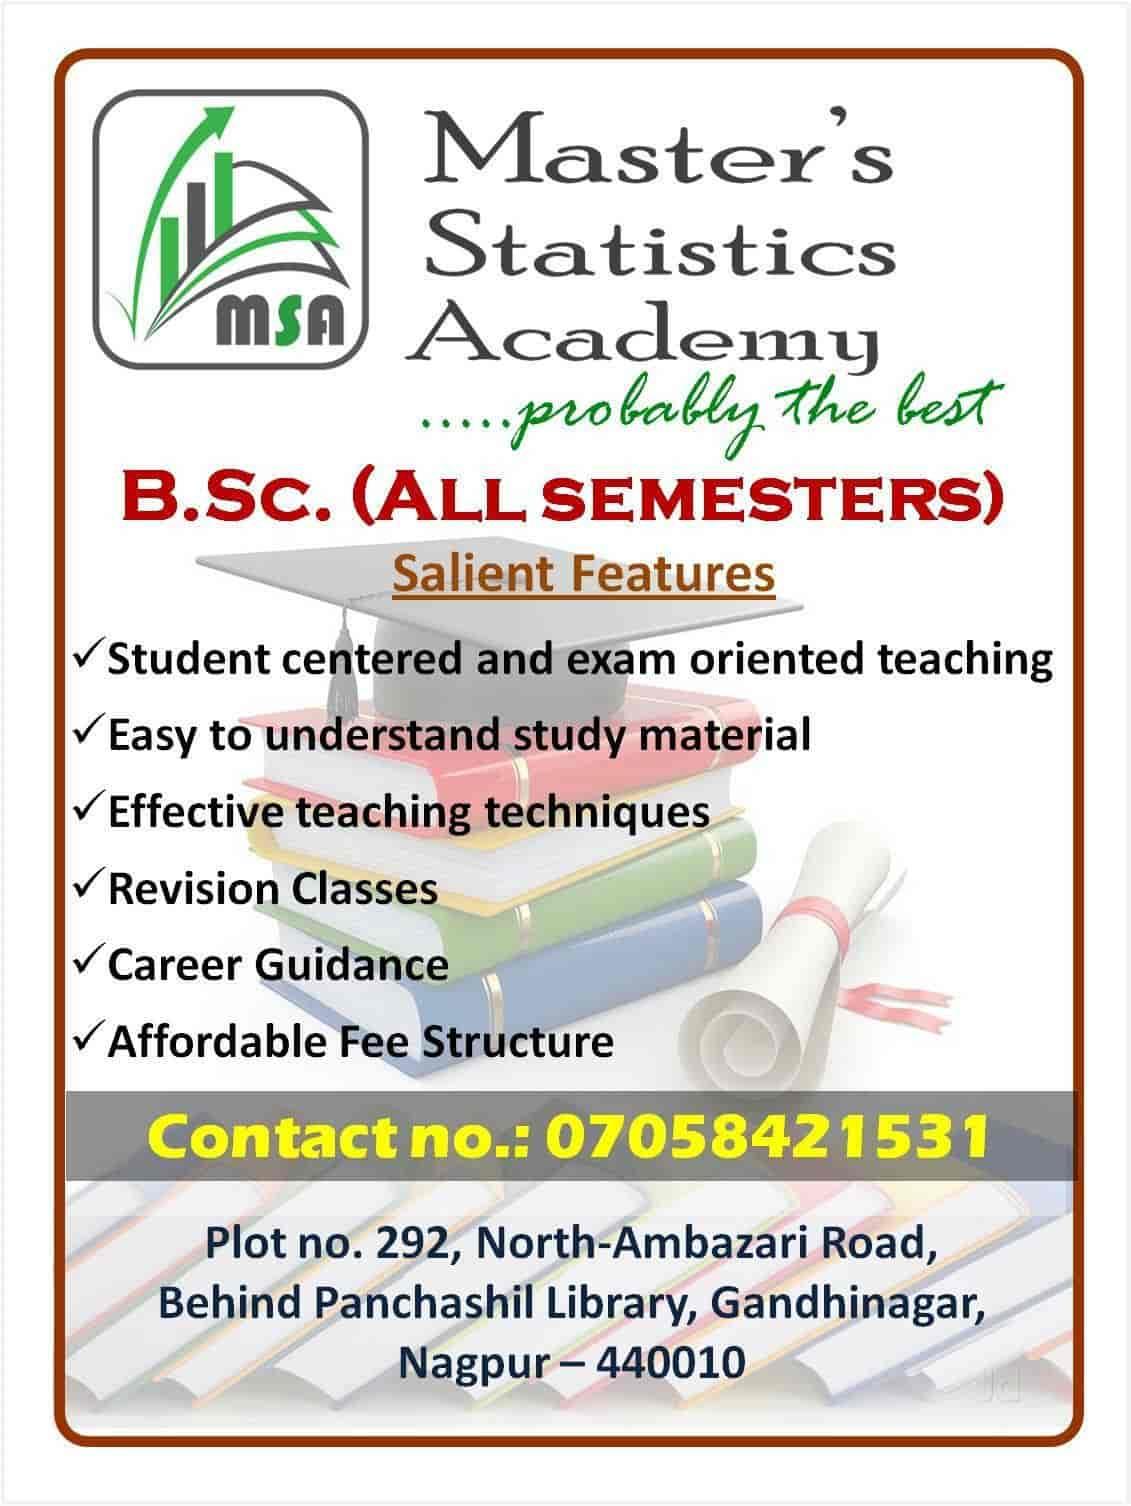 Master's Statistics Academy, Gandhi Nagar - Tutorials For BSc in